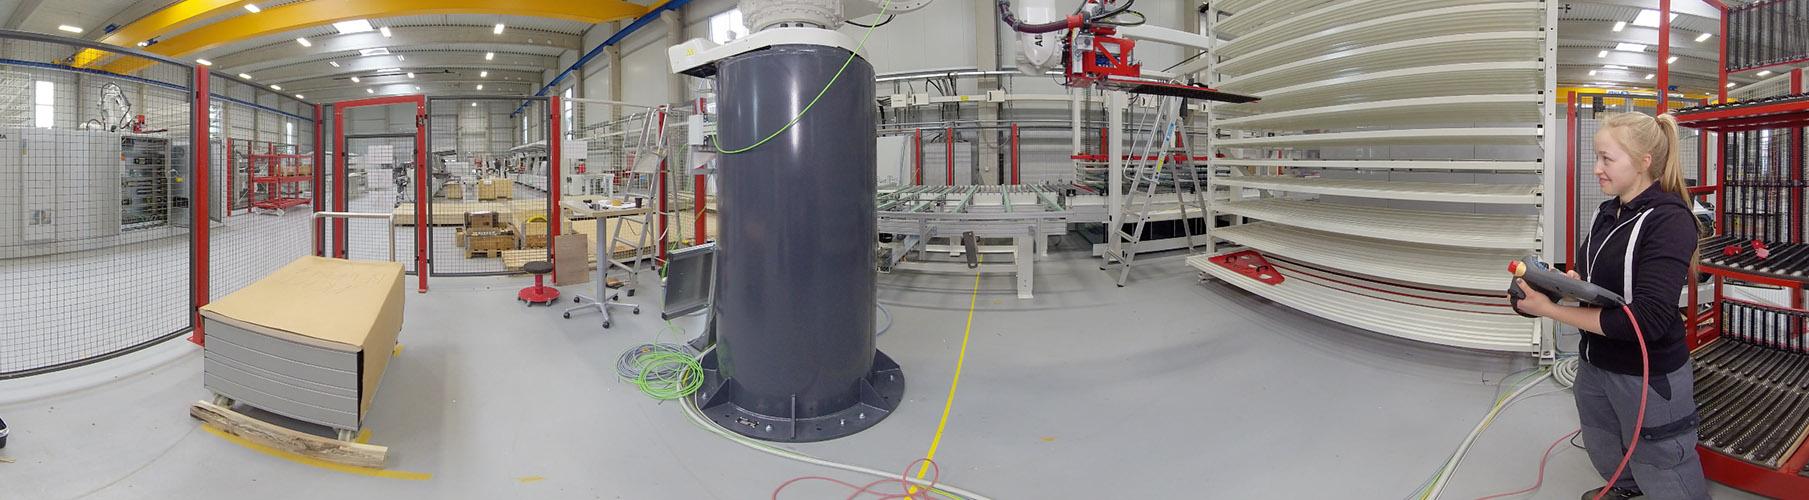 360° VR Film Produktion Gütersloh